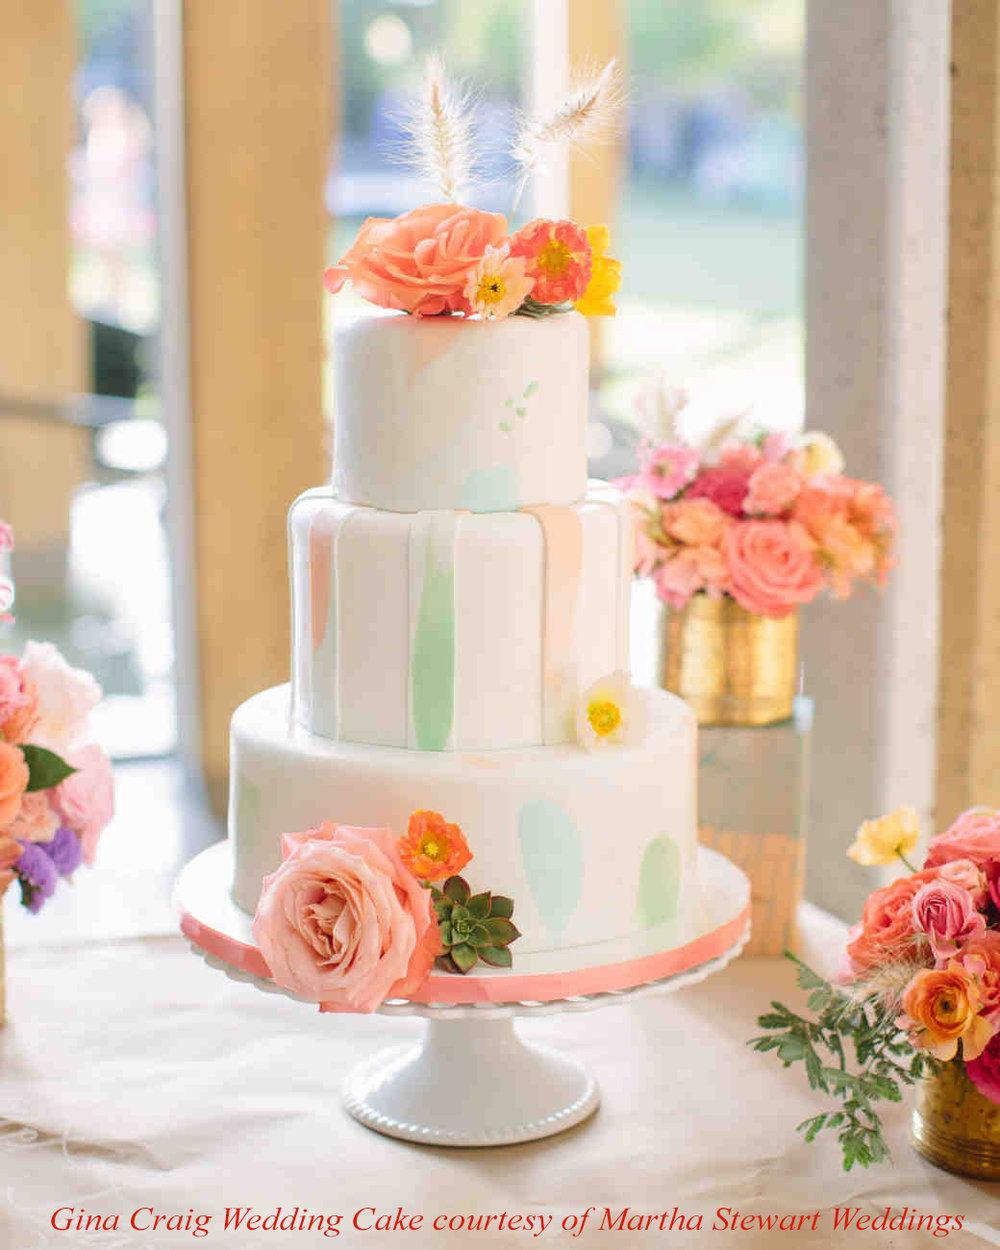 gina-craig-wedding-cake-0514_vert.jpg